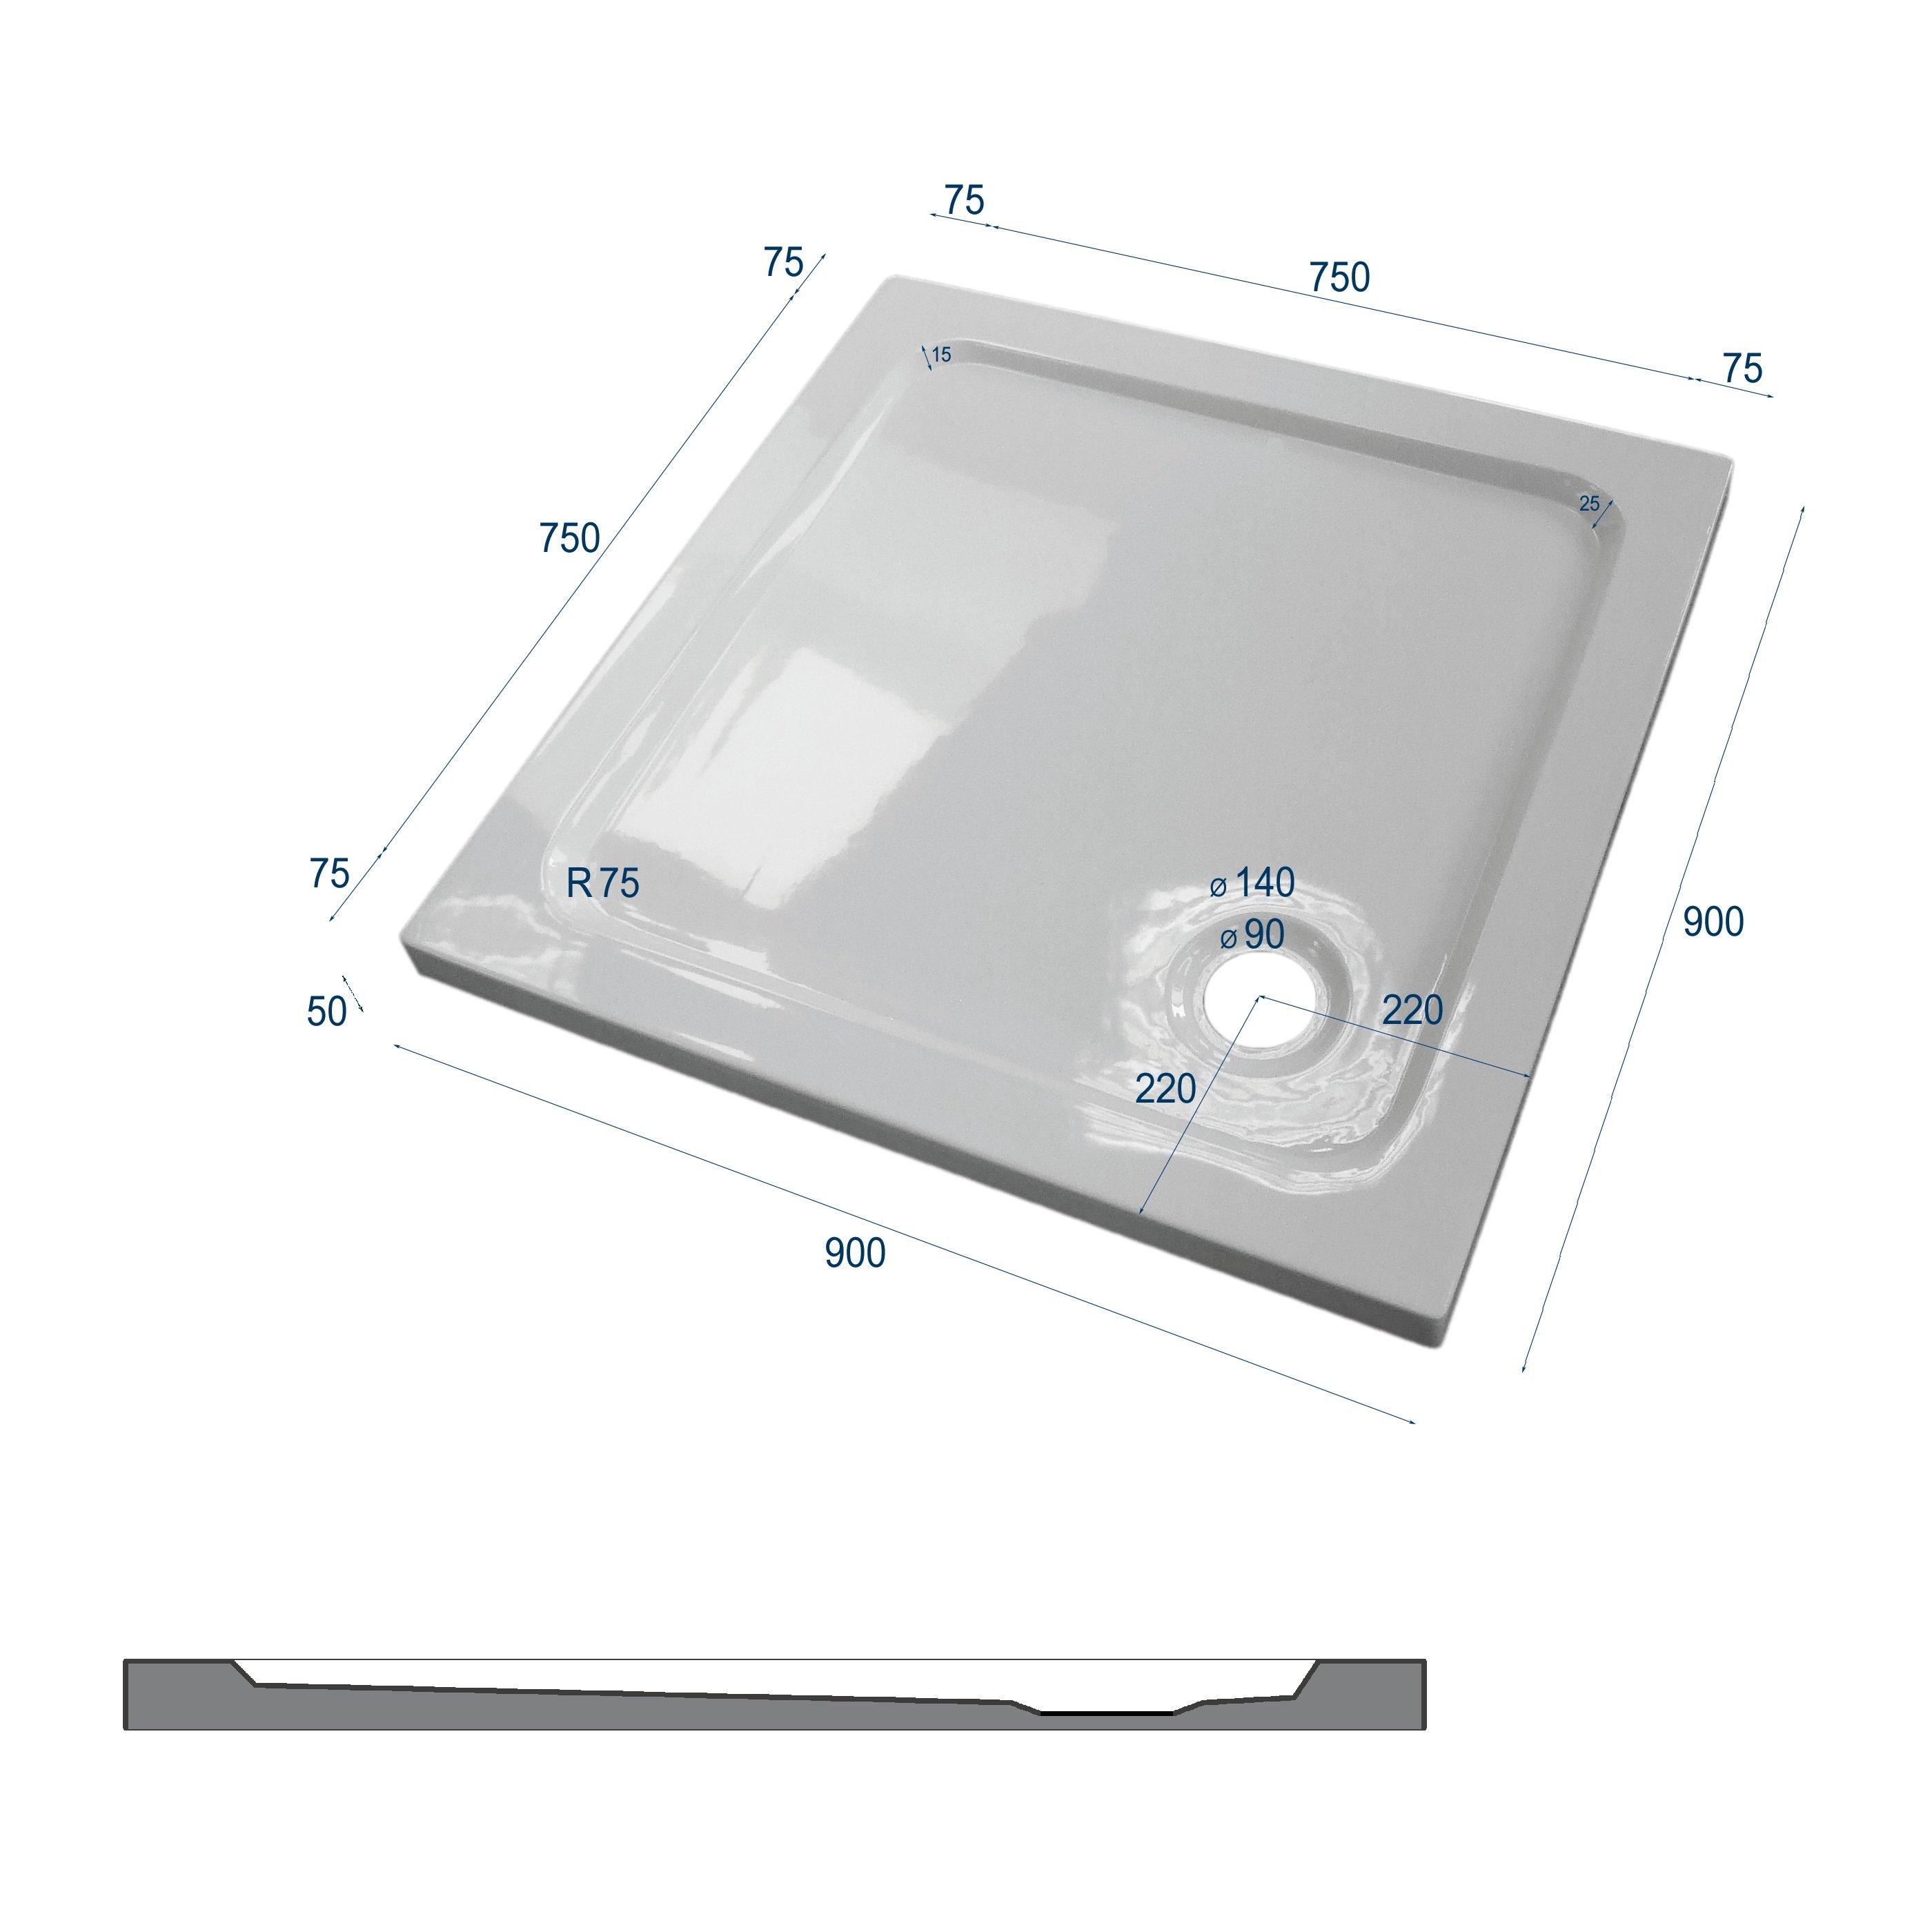 Duschtasse Duschwanne quadratisch - 90 x 90 cm inkl. Ablaufgarnitur zoom thumbnail 5